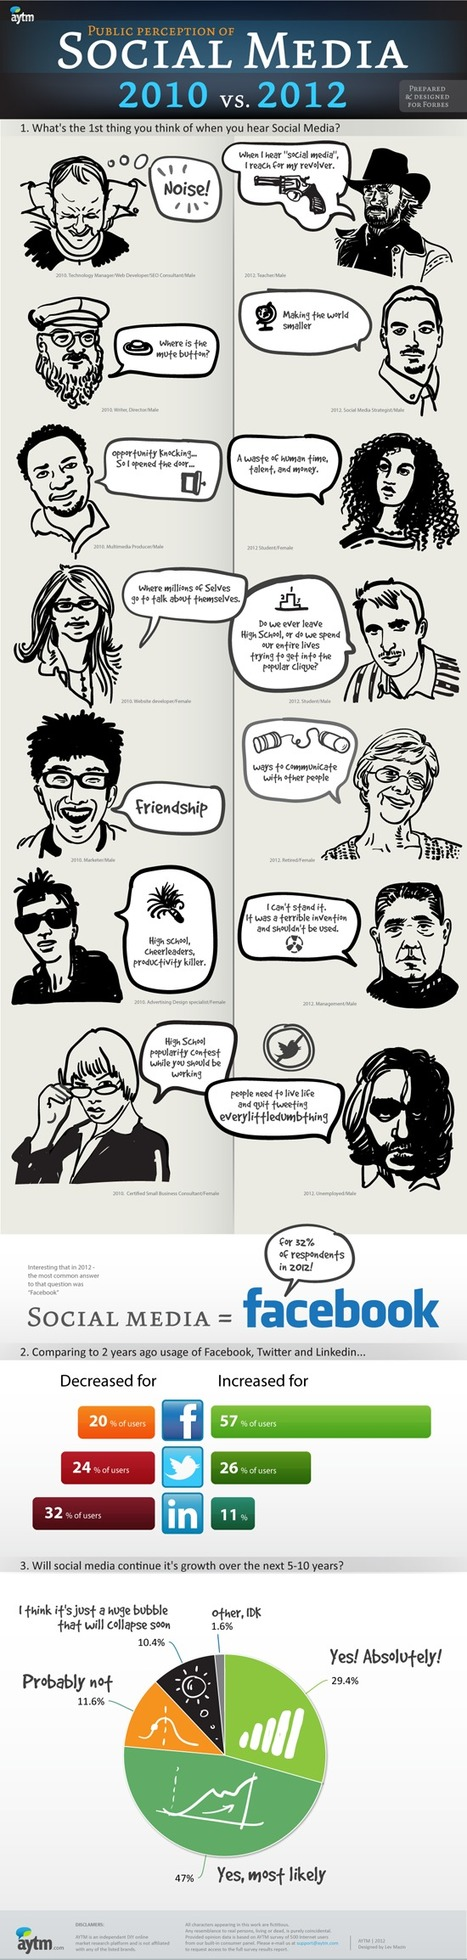 Public Perception Of Social Media - To Many Consumers, Social Media Equals Facebook | Surviving Social Chaos | Scoop.it